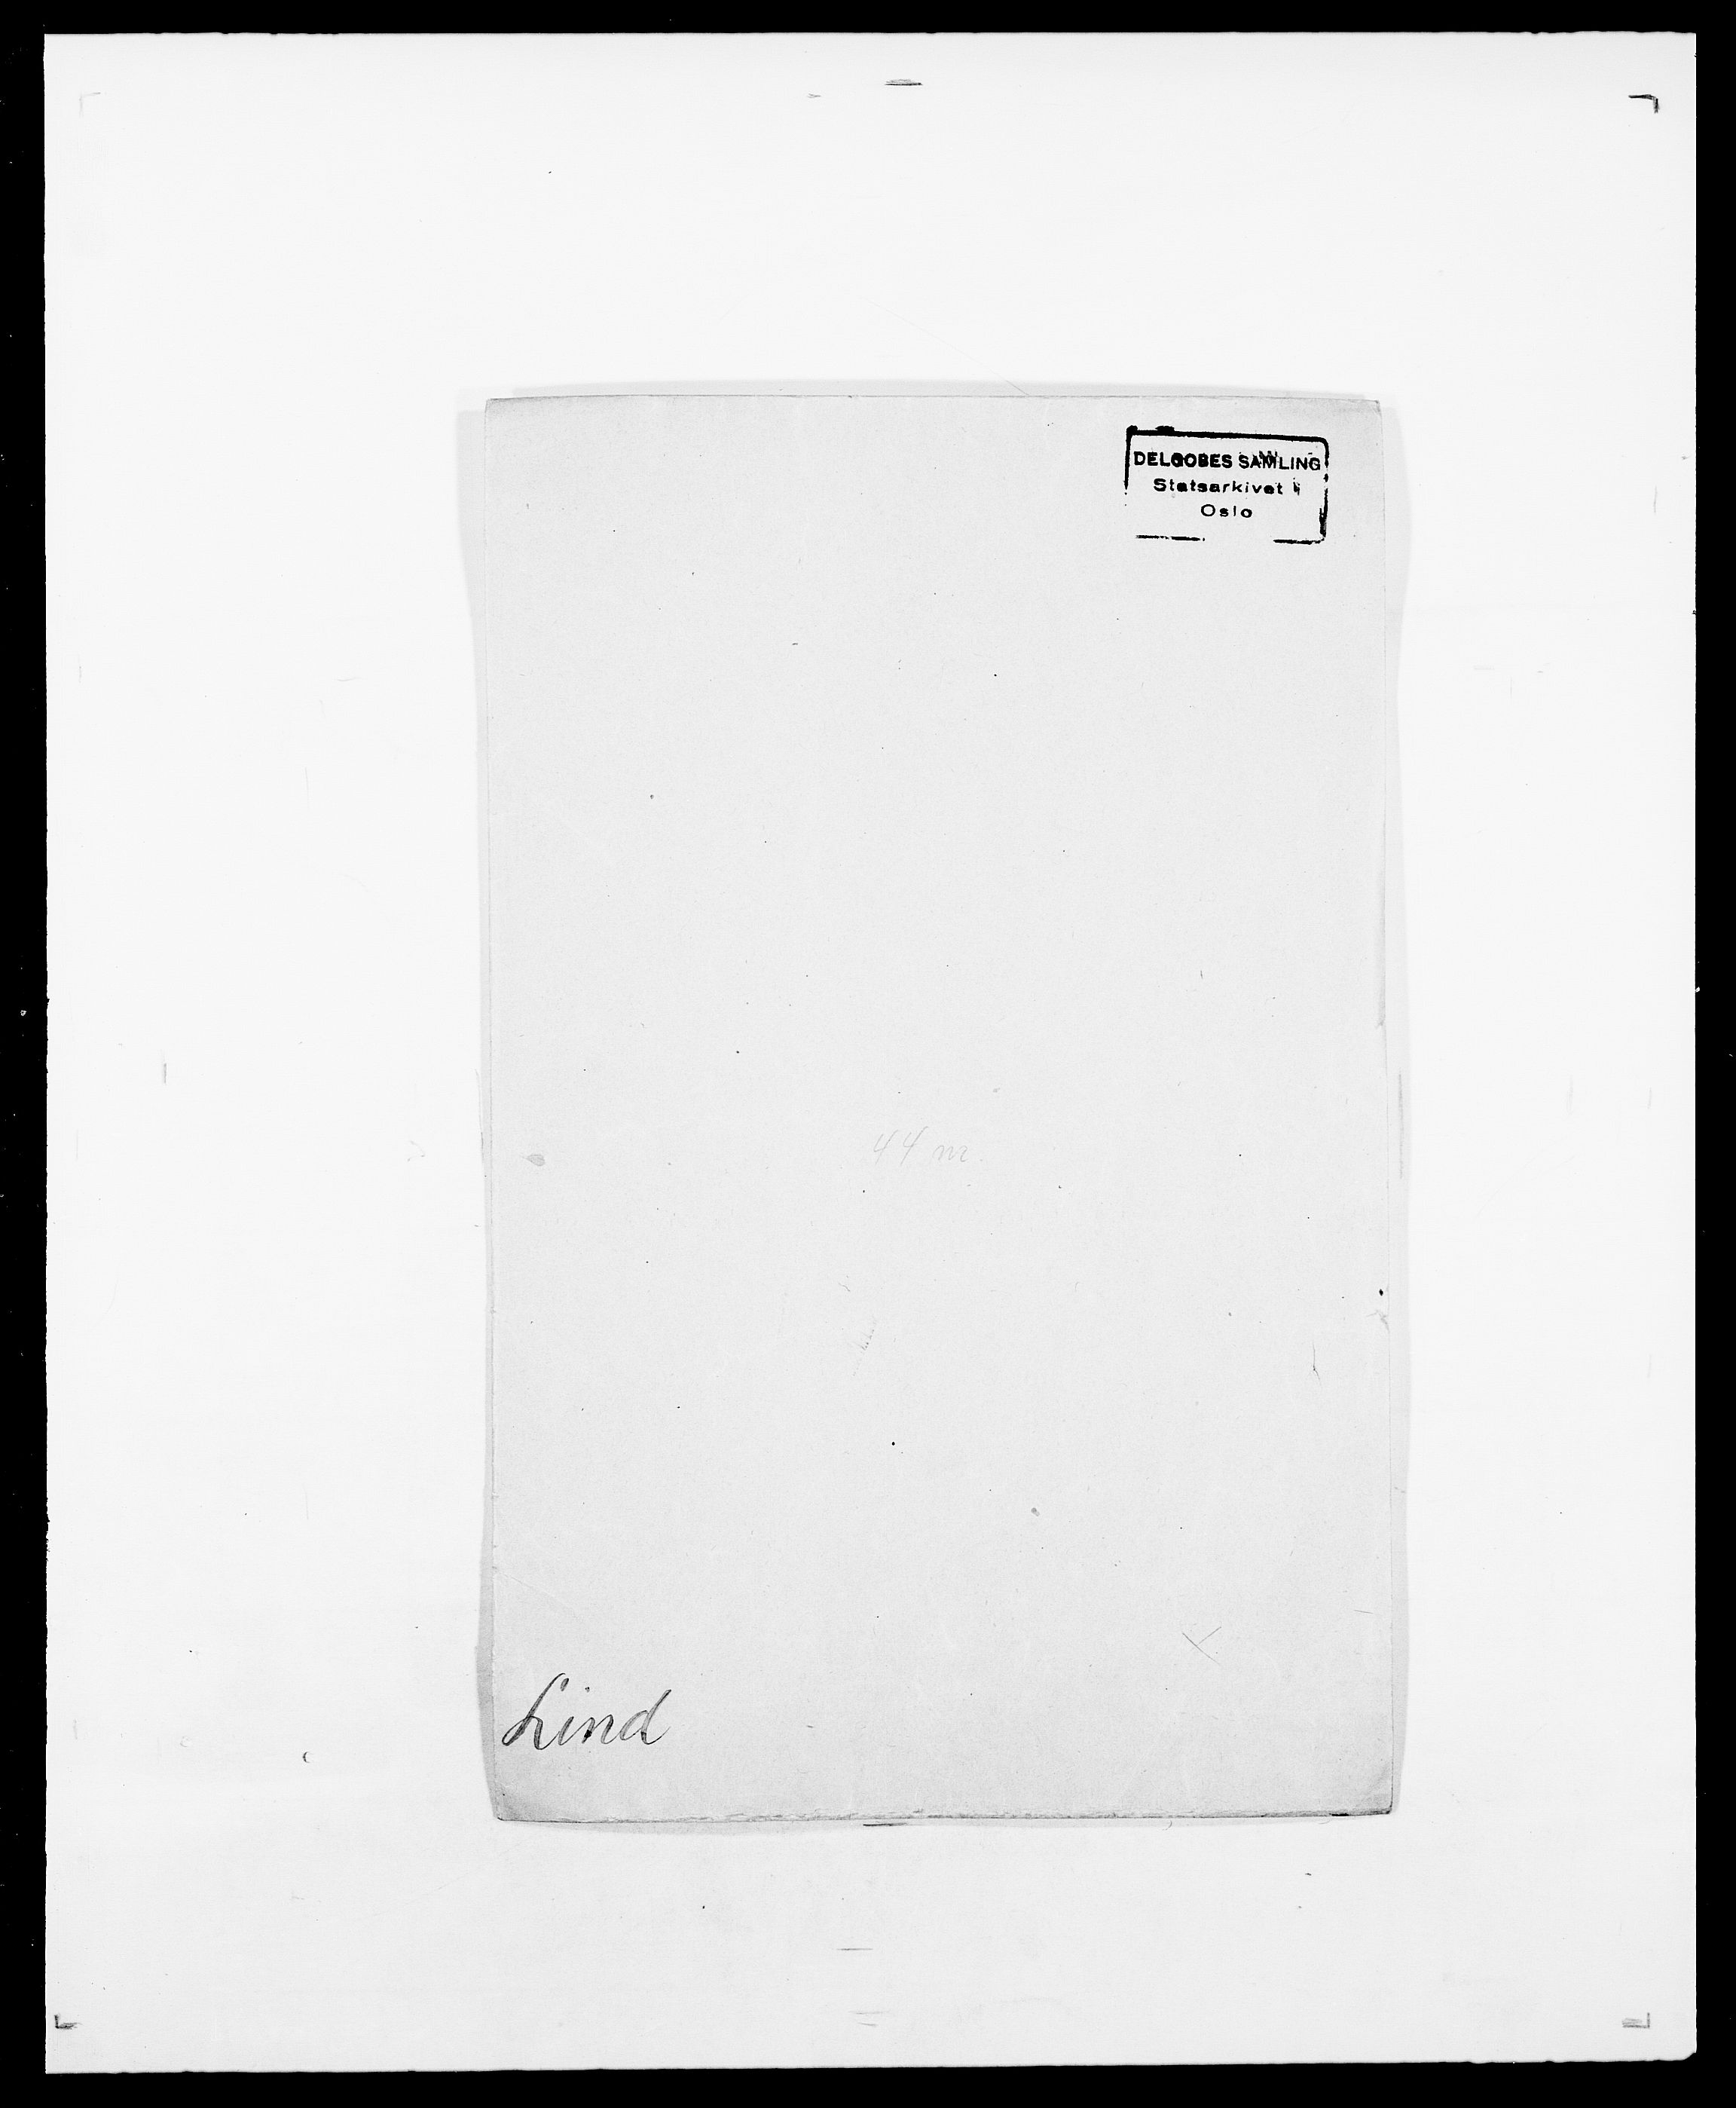 SAO, Delgobe, Charles Antoine - samling, D/Da/L0023: Lau - Lirvyn, s. 496